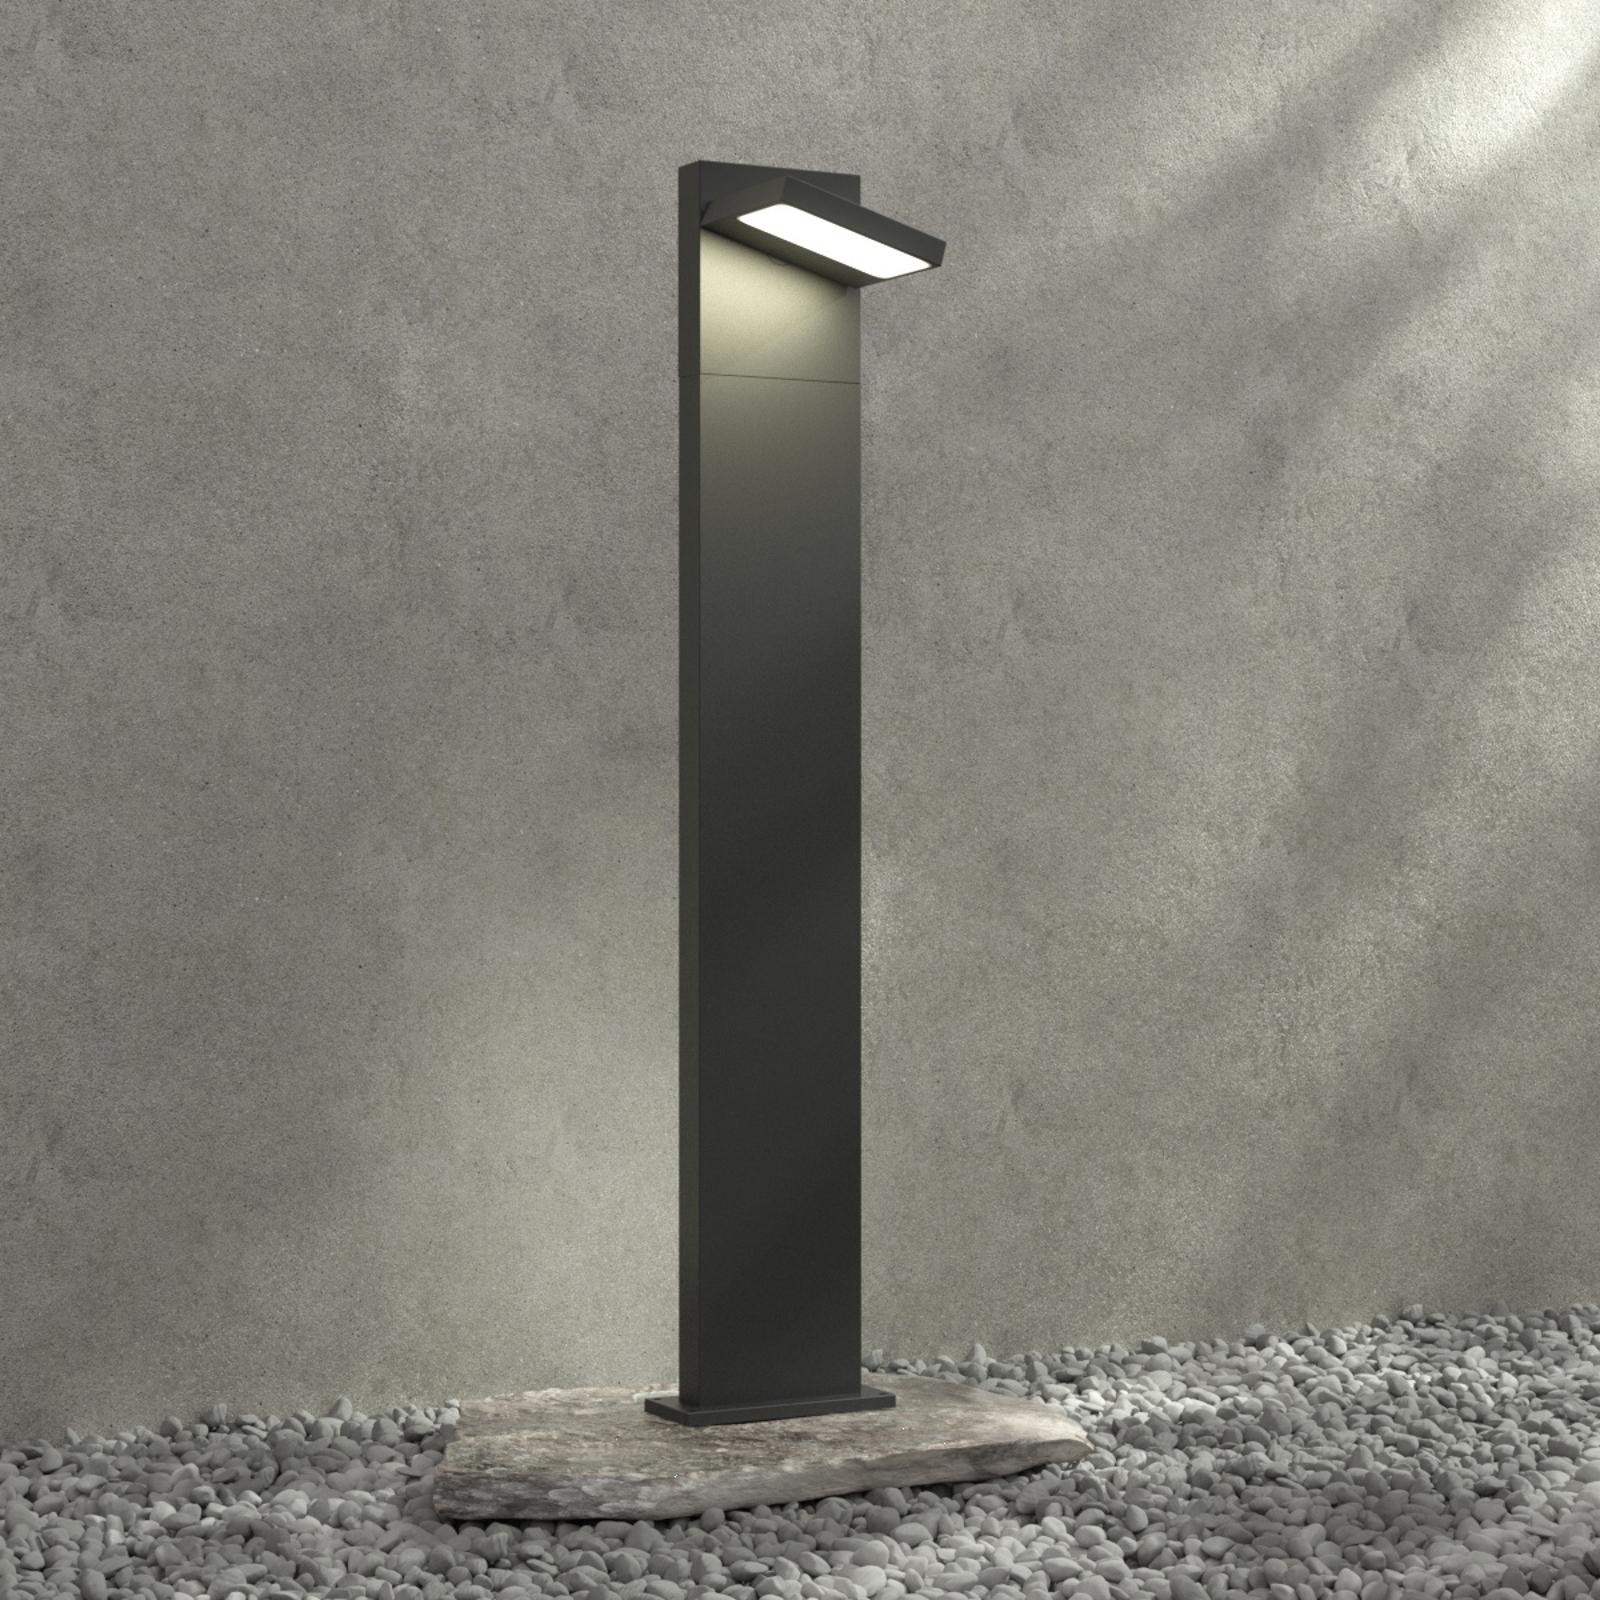 LED-Pollerleuchte Silvan, 100 cm